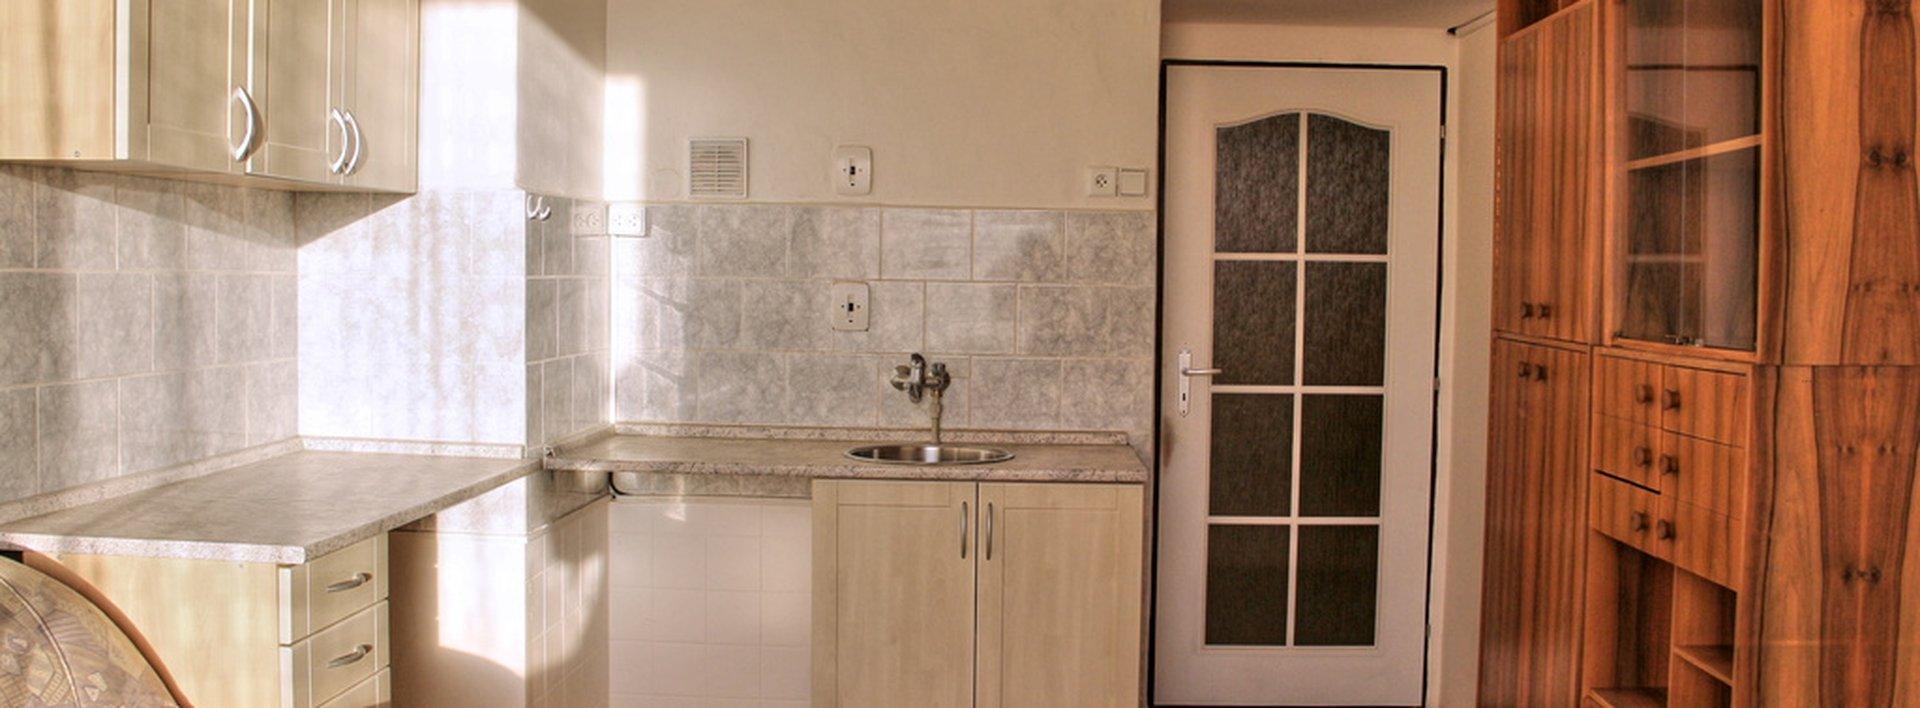 Prodej bytu 1+kk s prostornou šatnou o velikosti 35,65m², Ev.č.: N47003